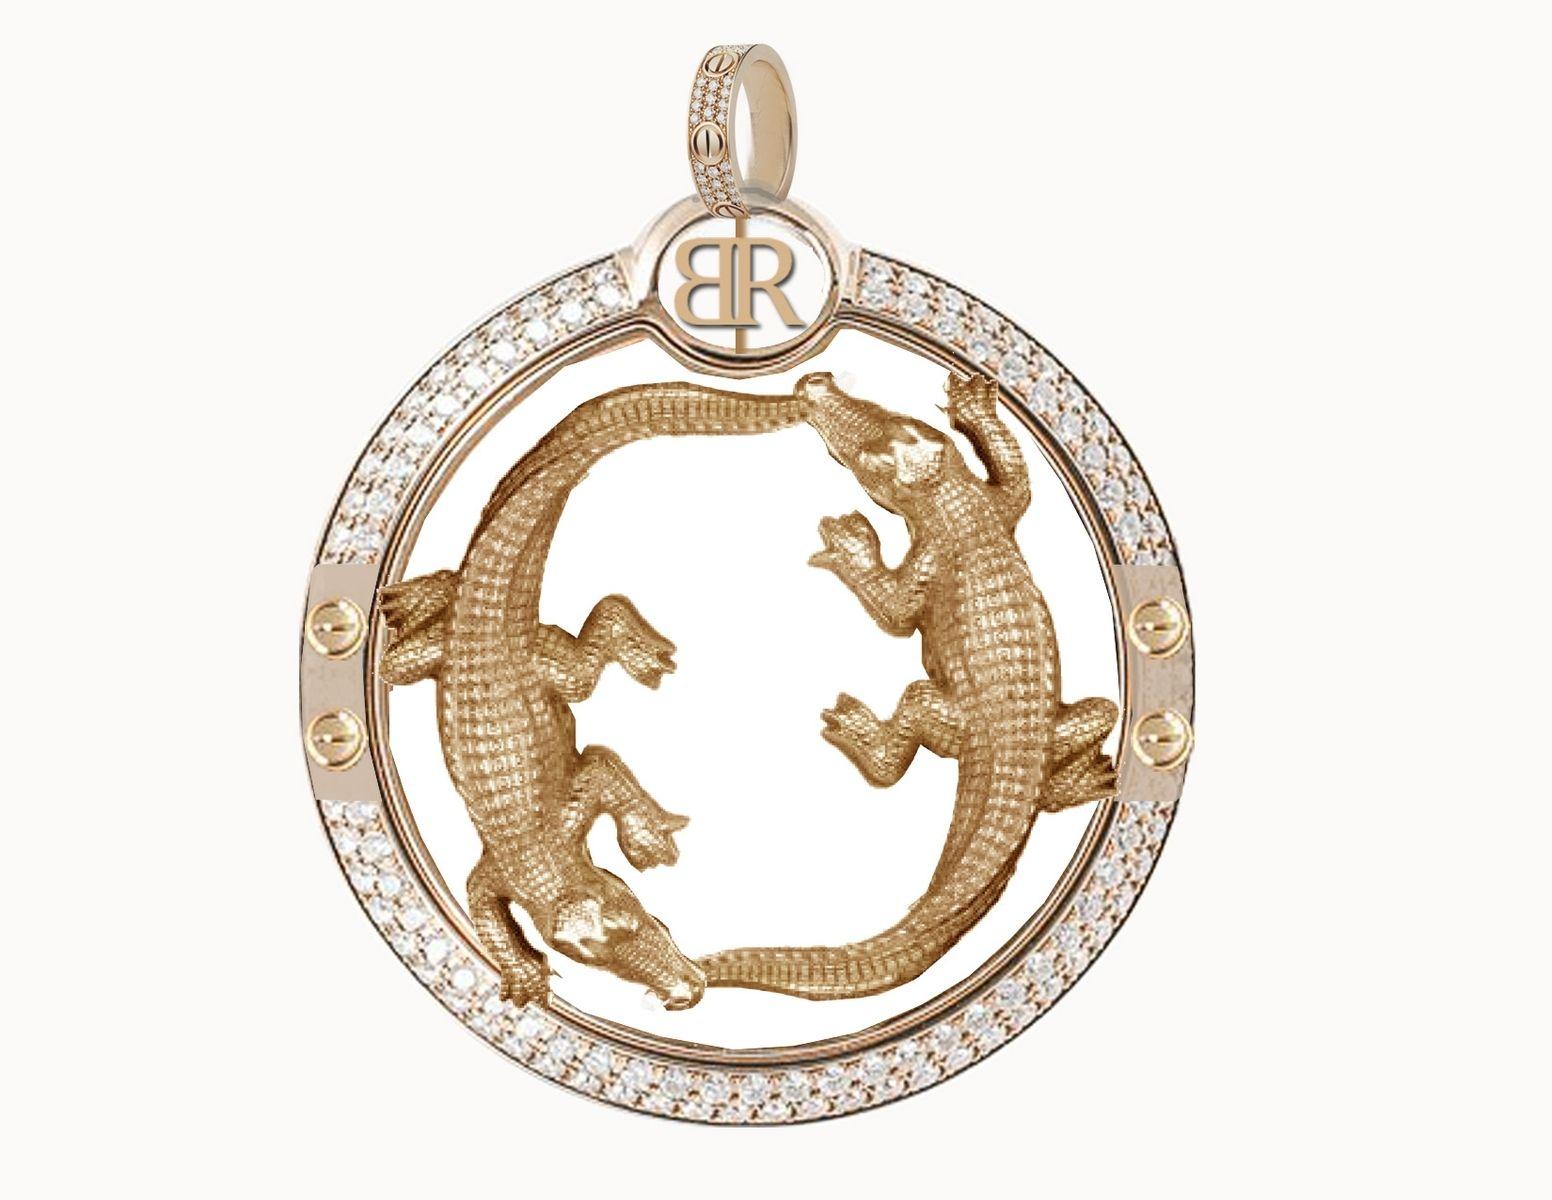 Custom double alligator diamond pendant by jewelryking design lab custom made double alligator diamond pendant aloadofball Image collections